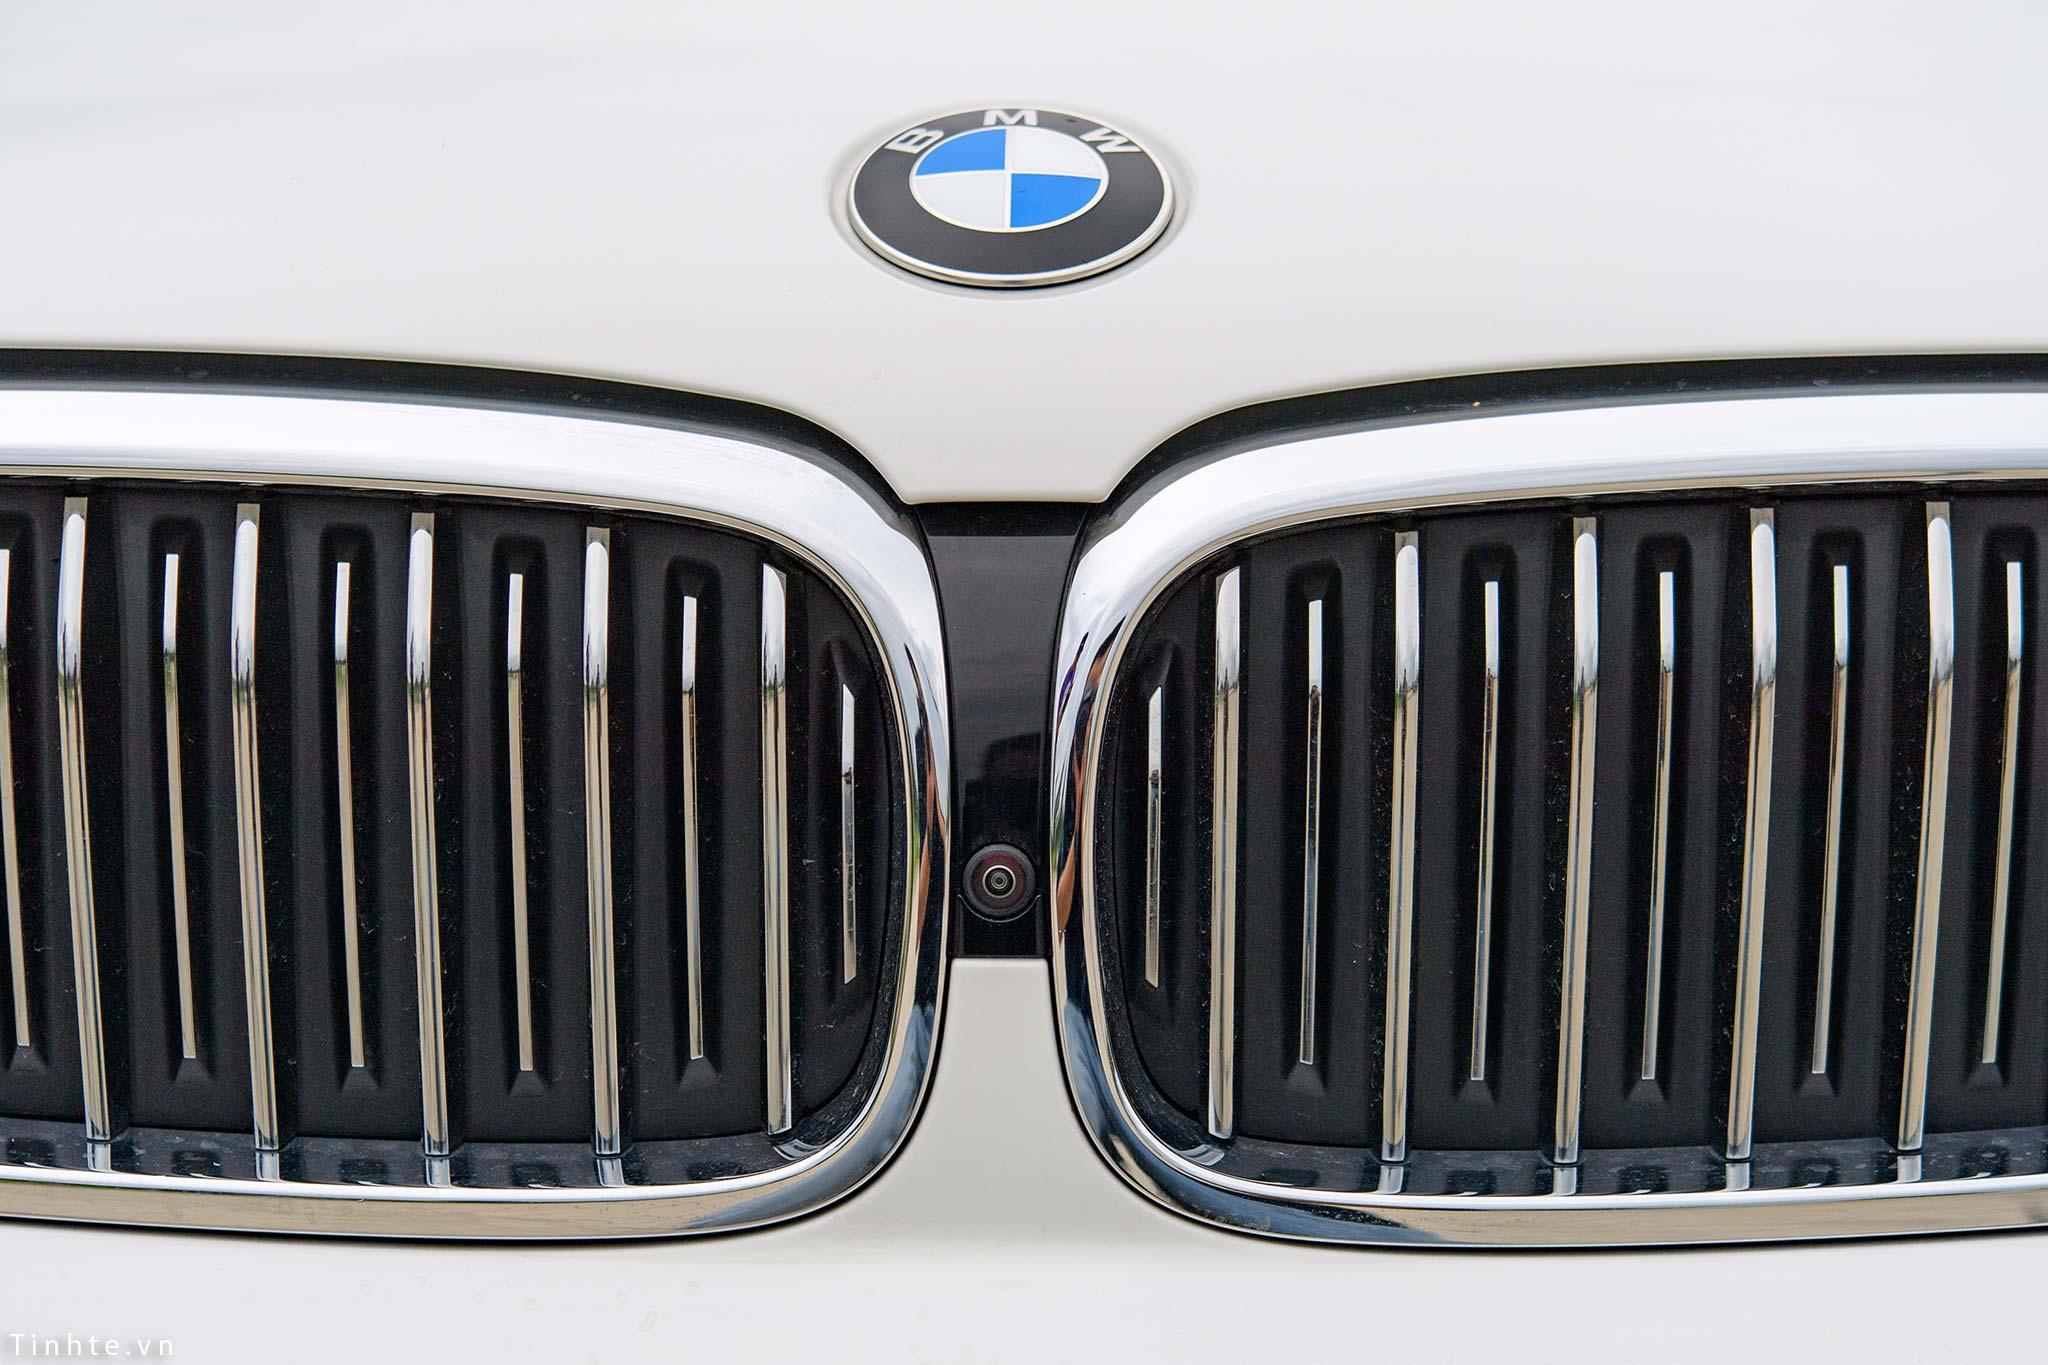 BMW_530i_G30_tinhte_2.jpg